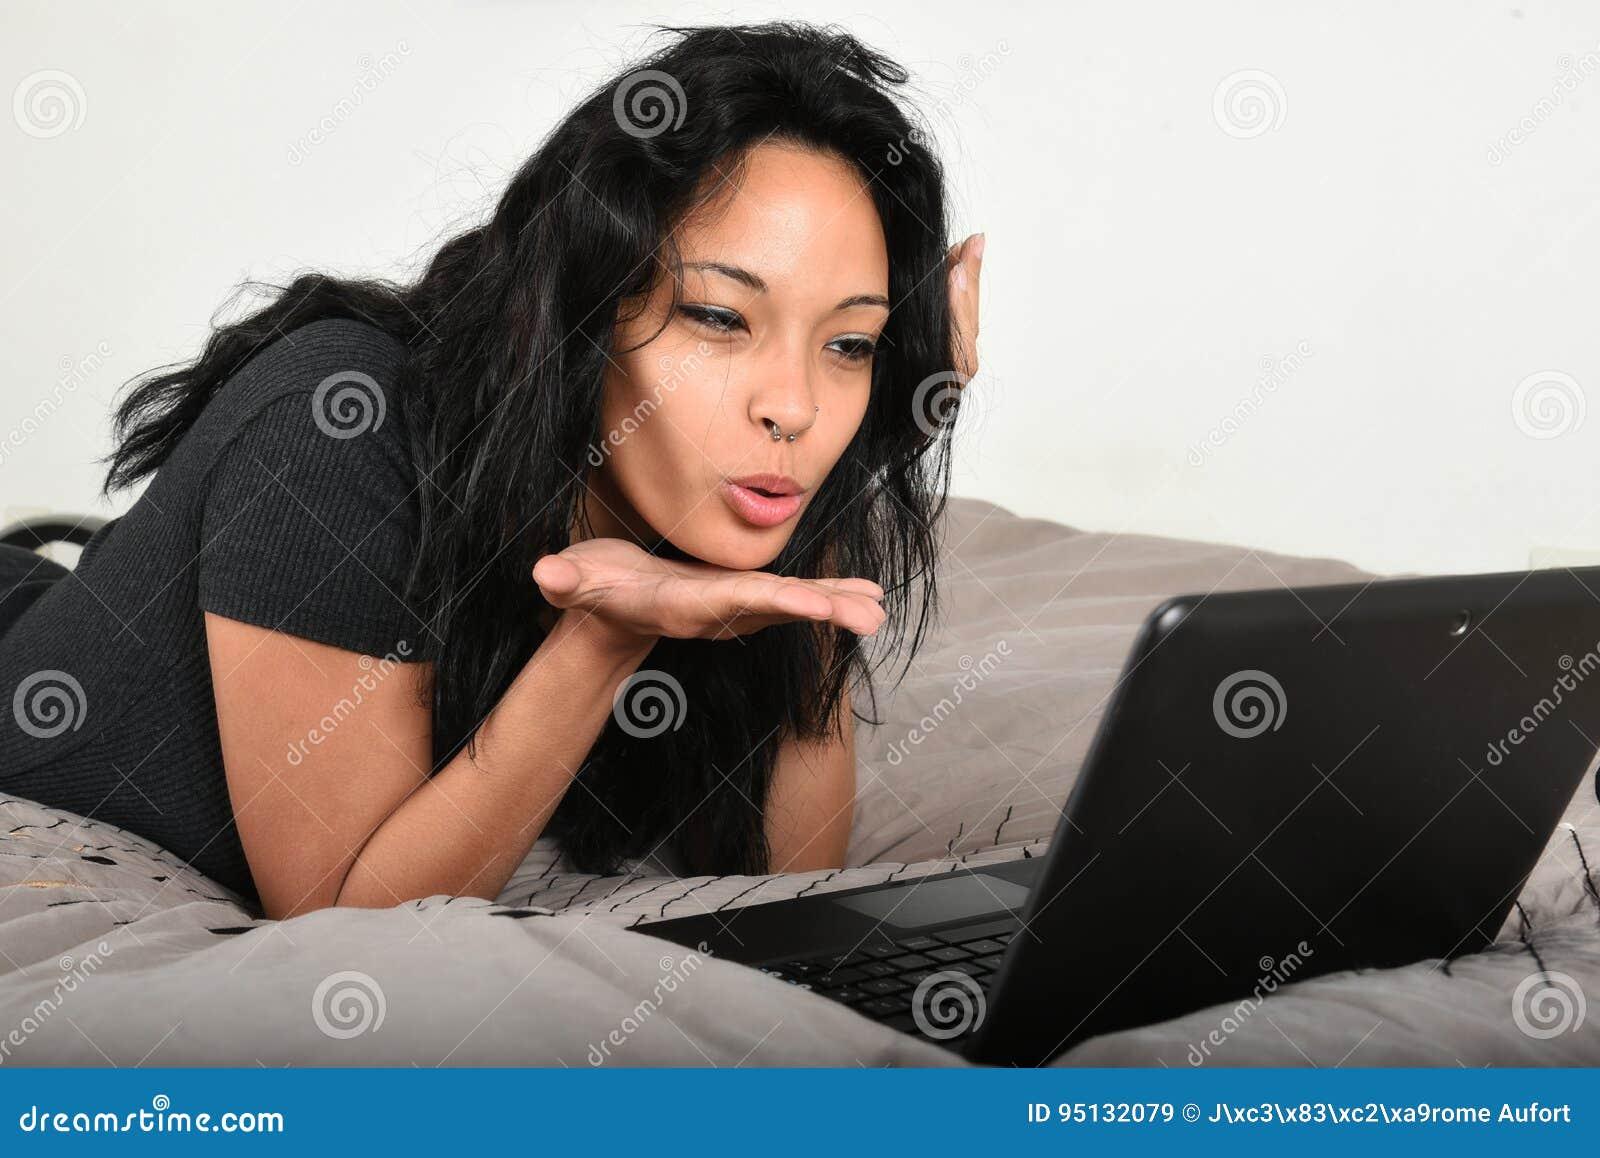 dating site Young huwelijk niet dating EP 2 eng sub gooddrama